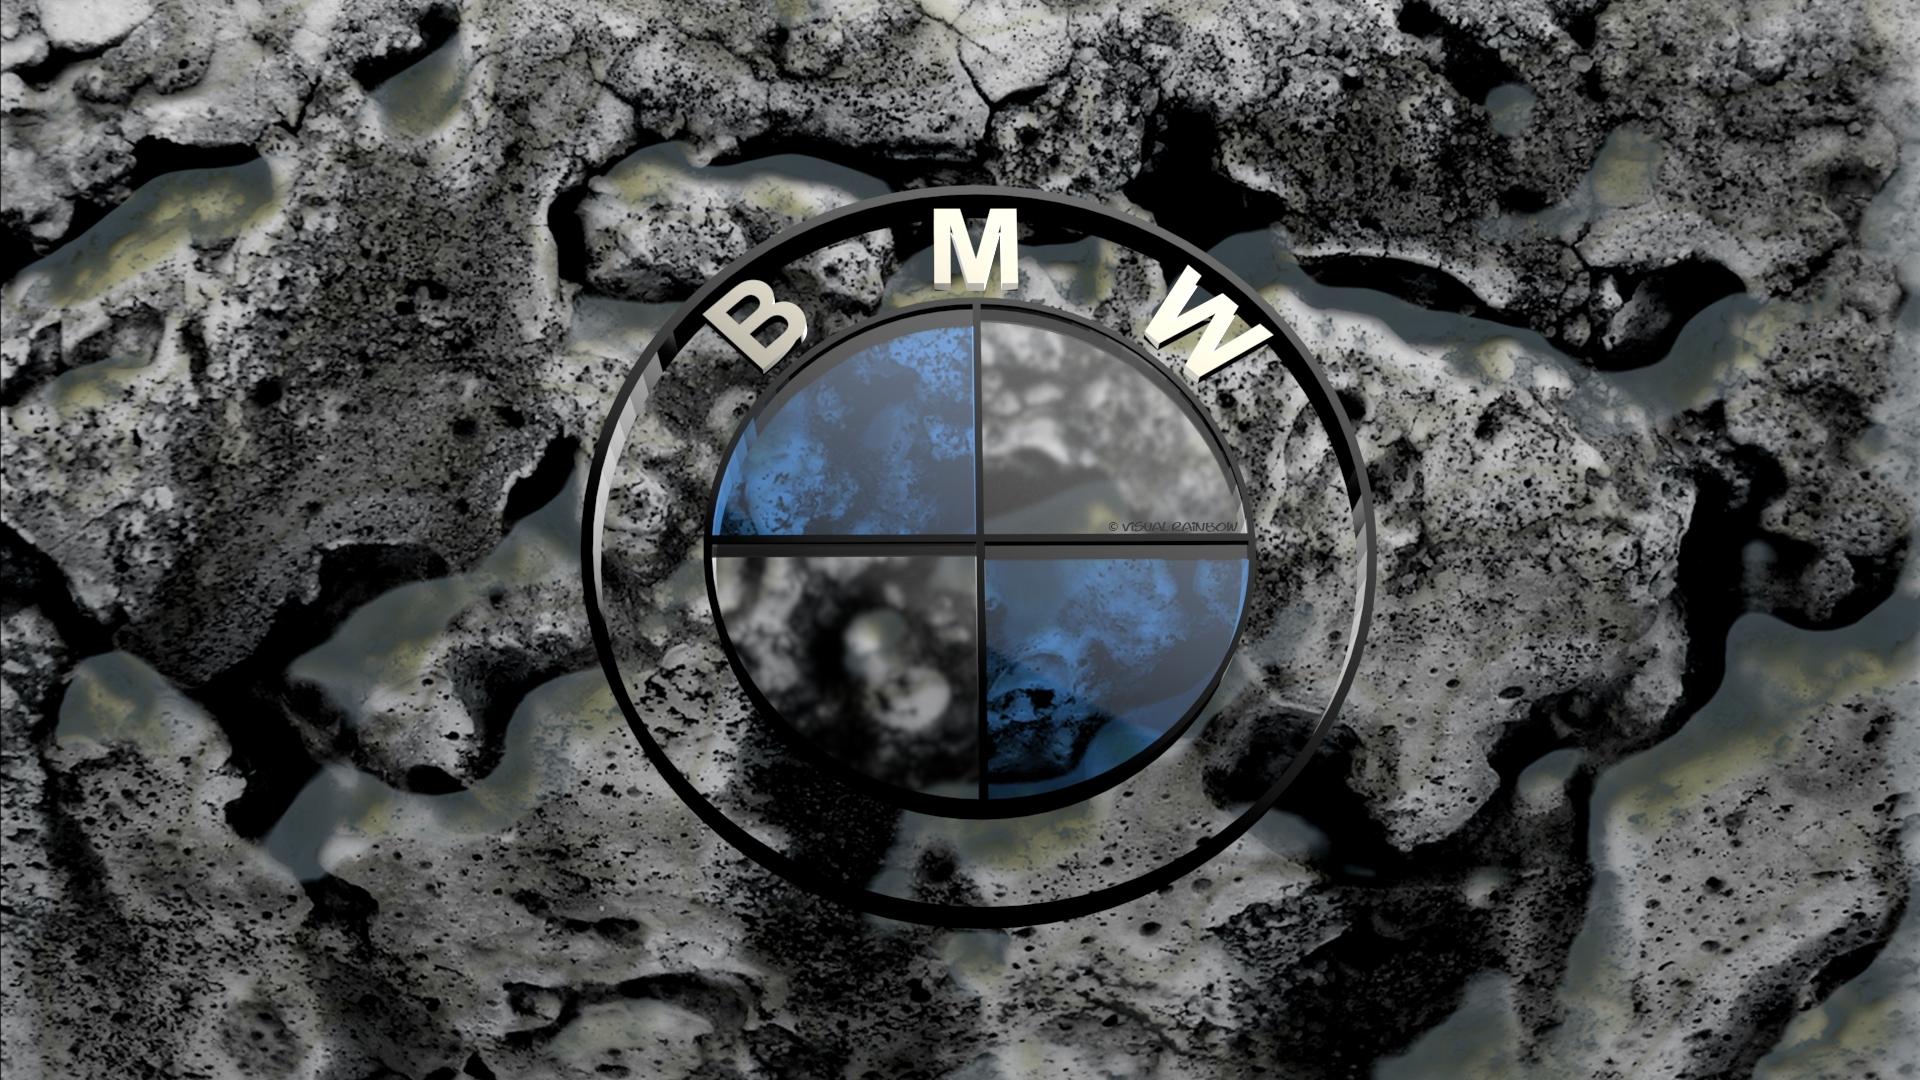 Bmw Wallpaper Hd Free Download Download Free Bmw Logo Background Pixelstalk Net